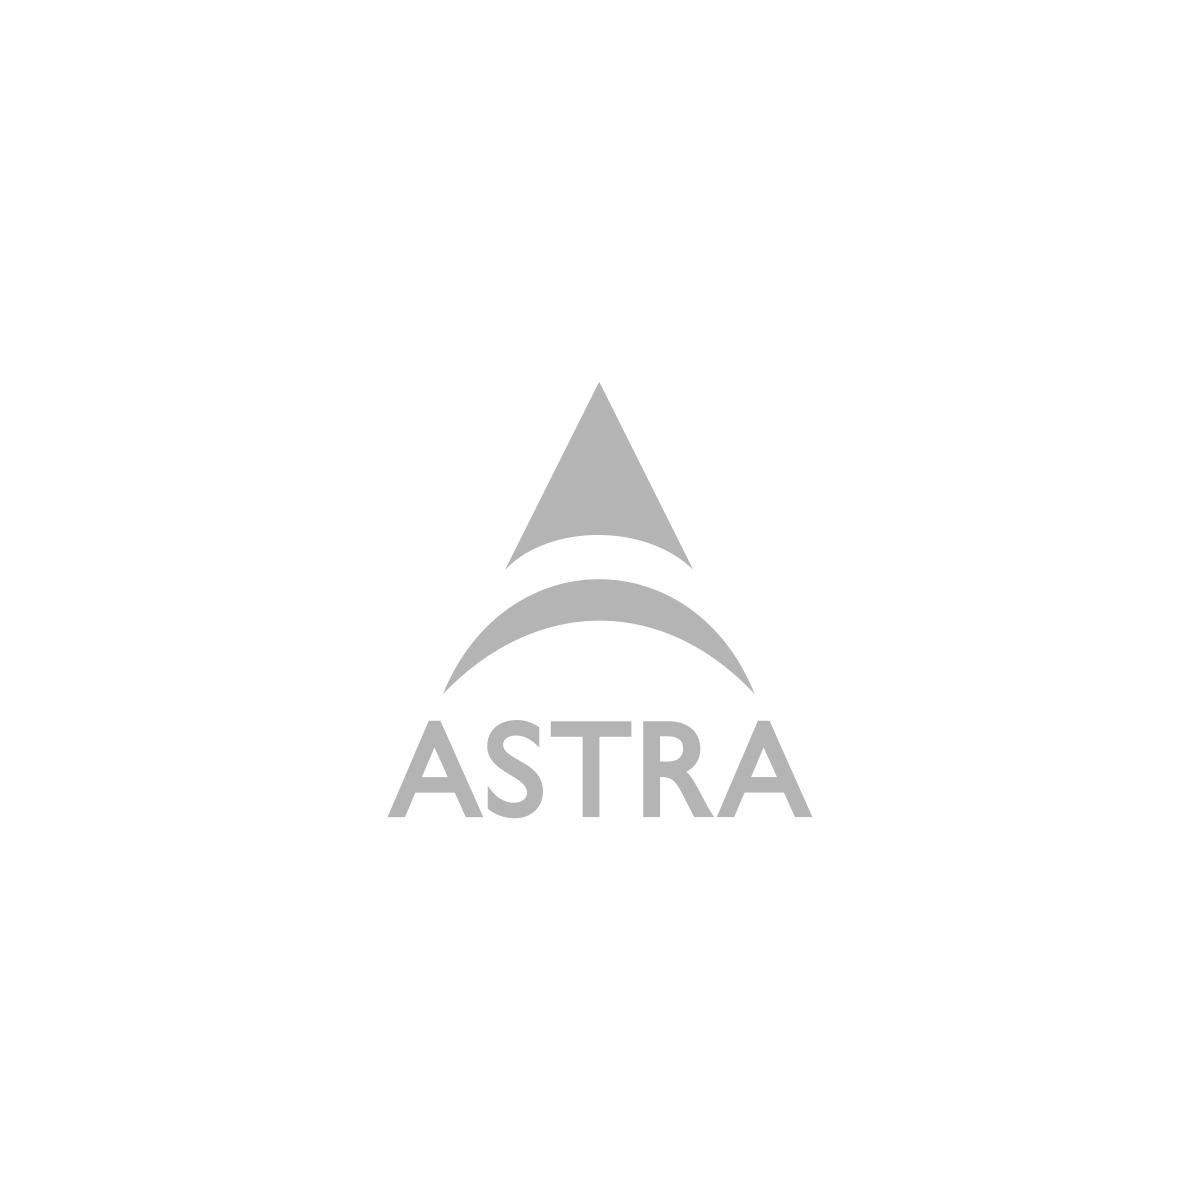 [klienti/Astra.png]